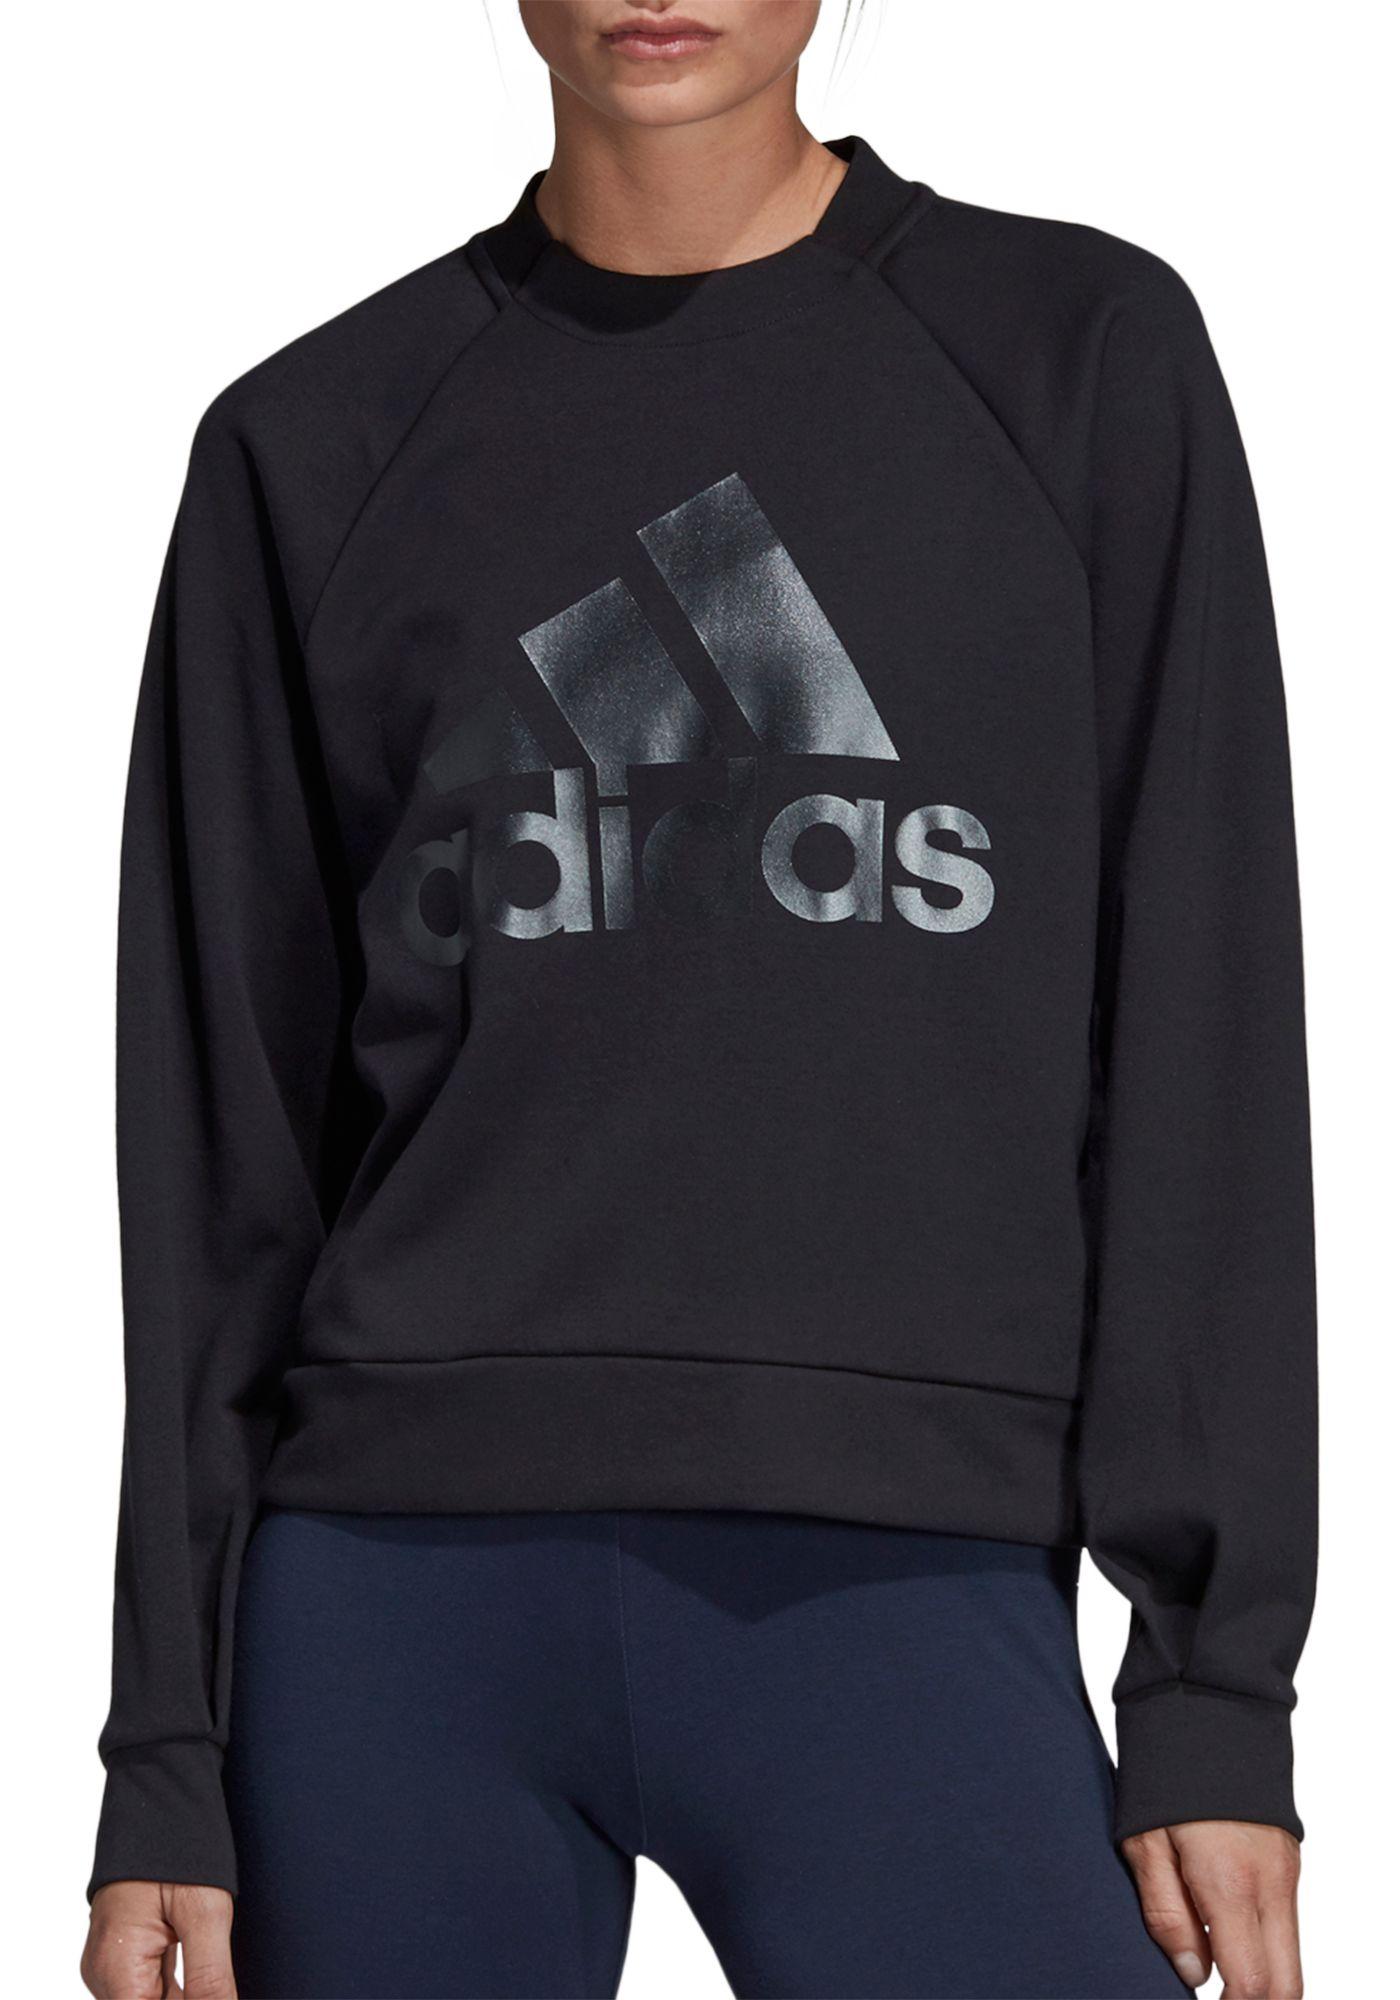 adidas Women's ID Glory Crewneck Sweatshirt